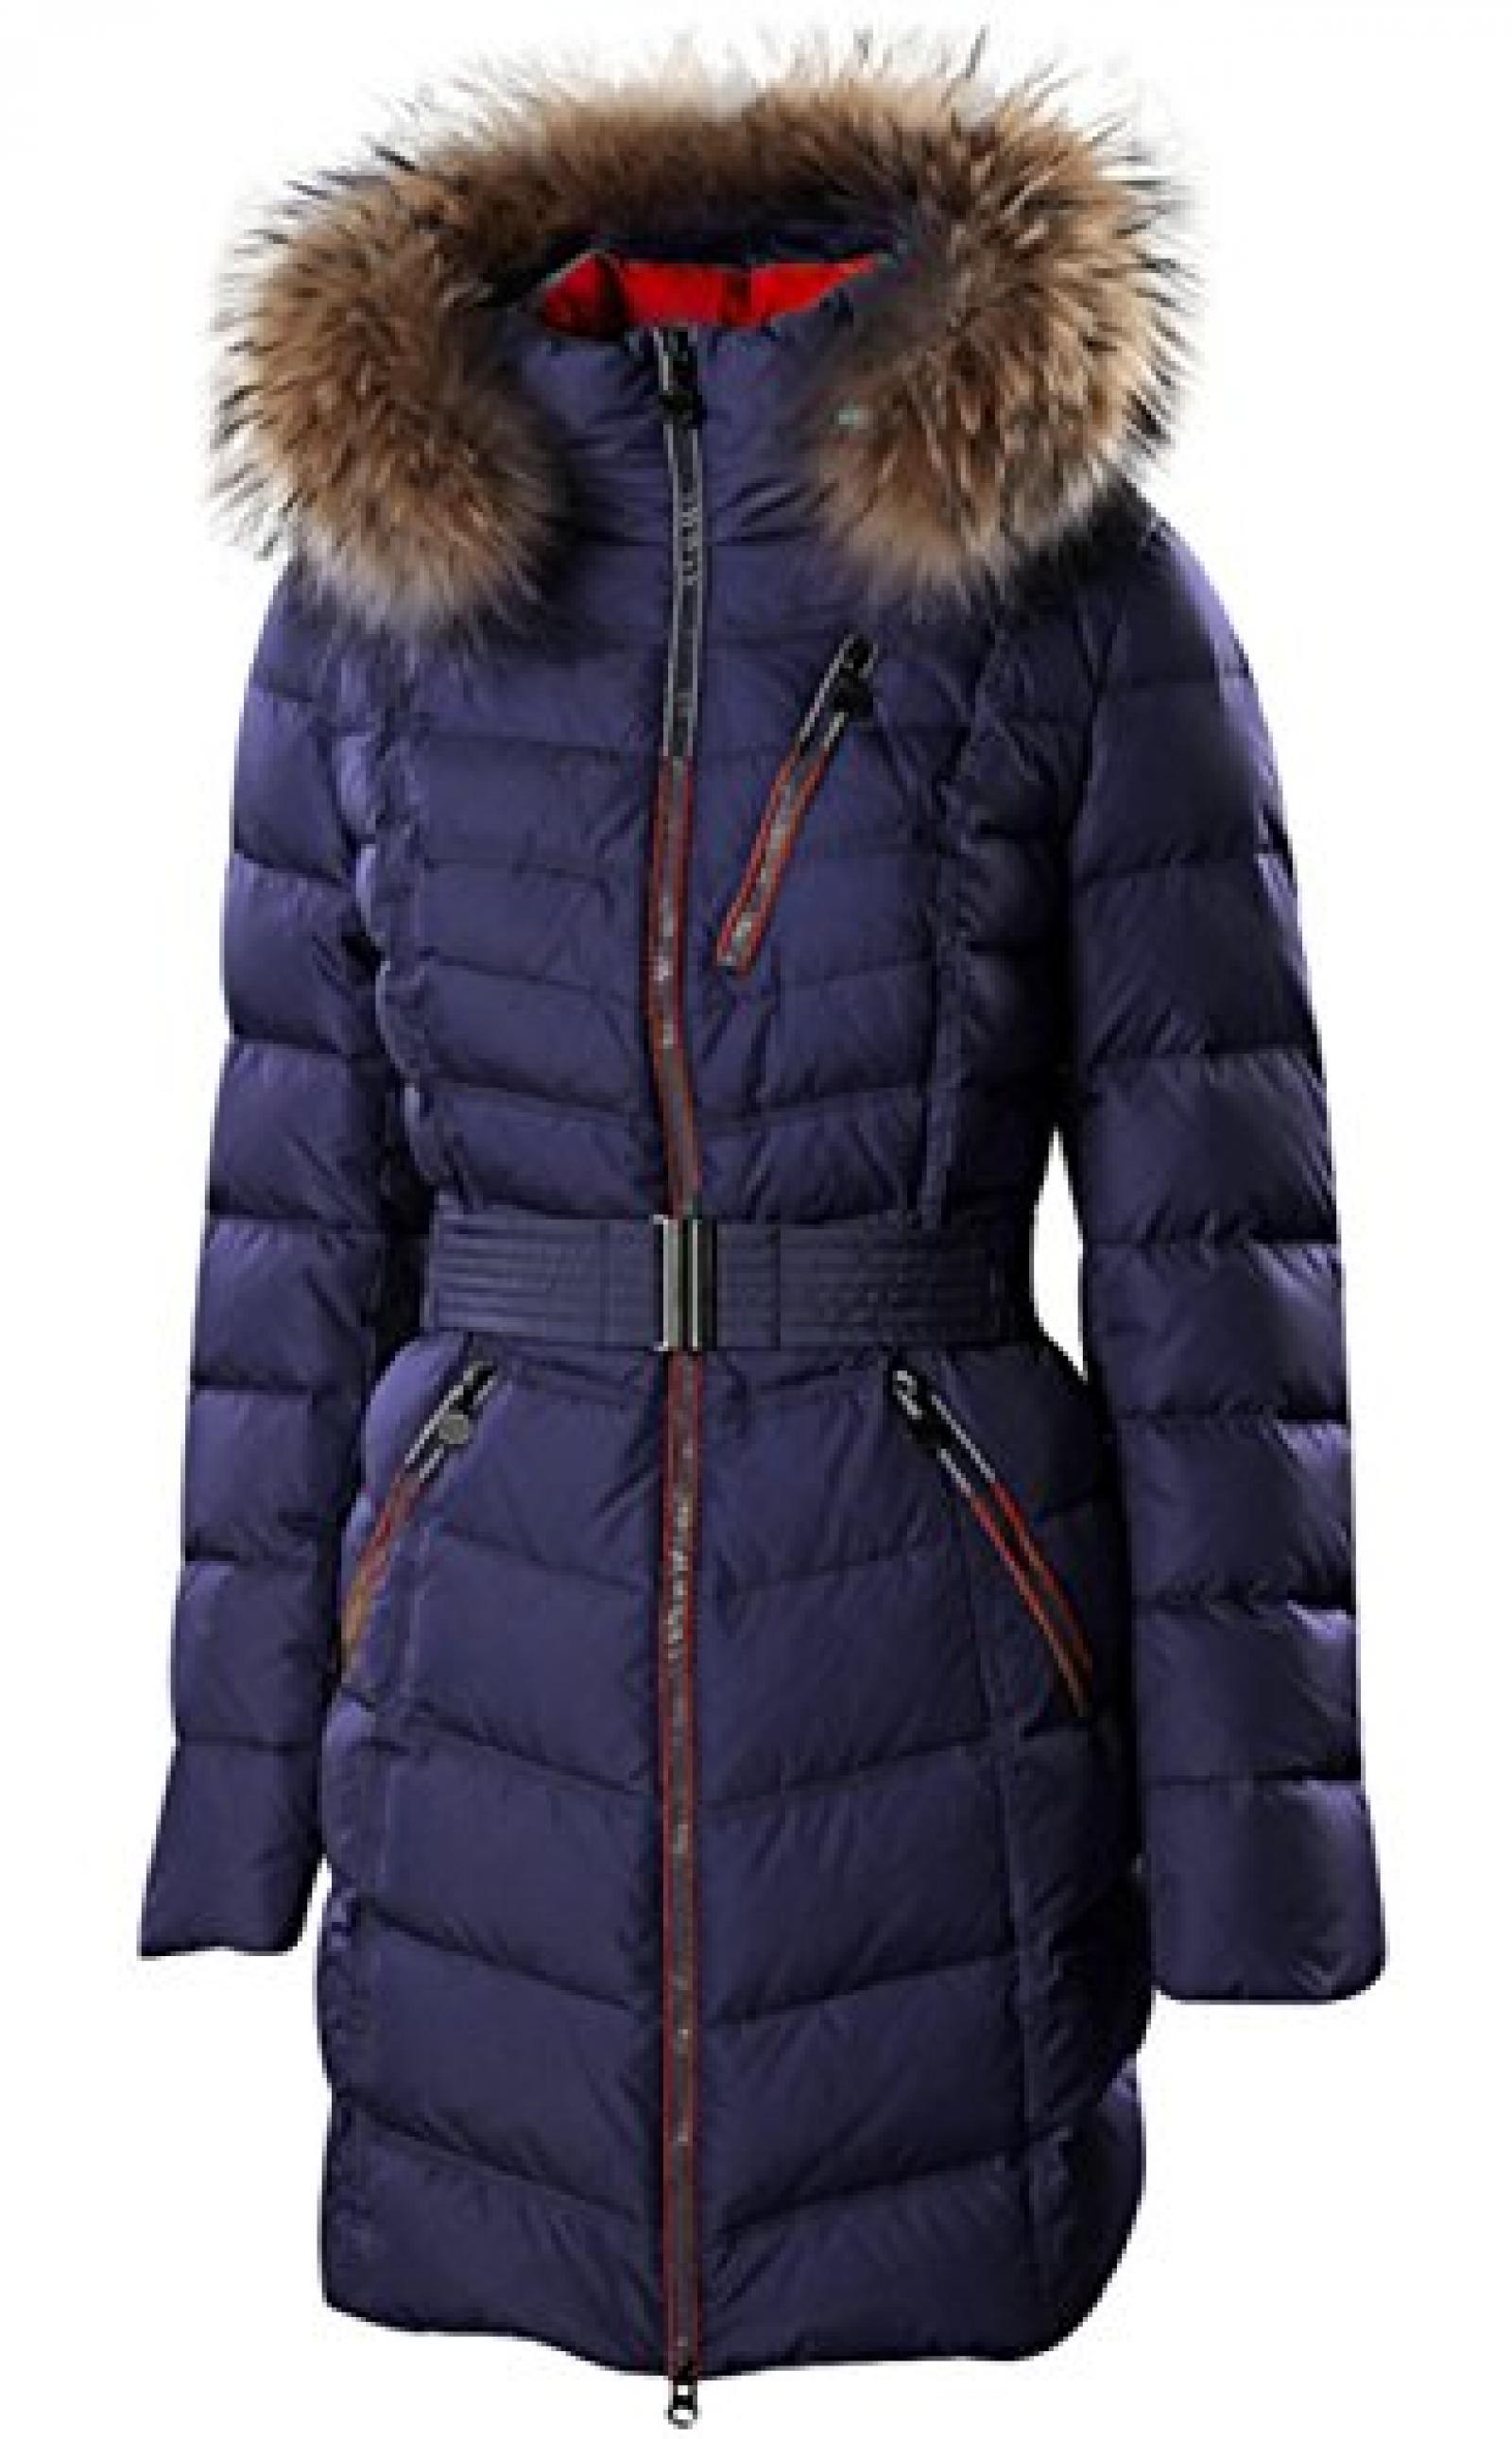 Q337 SNOWIMAGE Damen Daunenjacke Gr.34-42